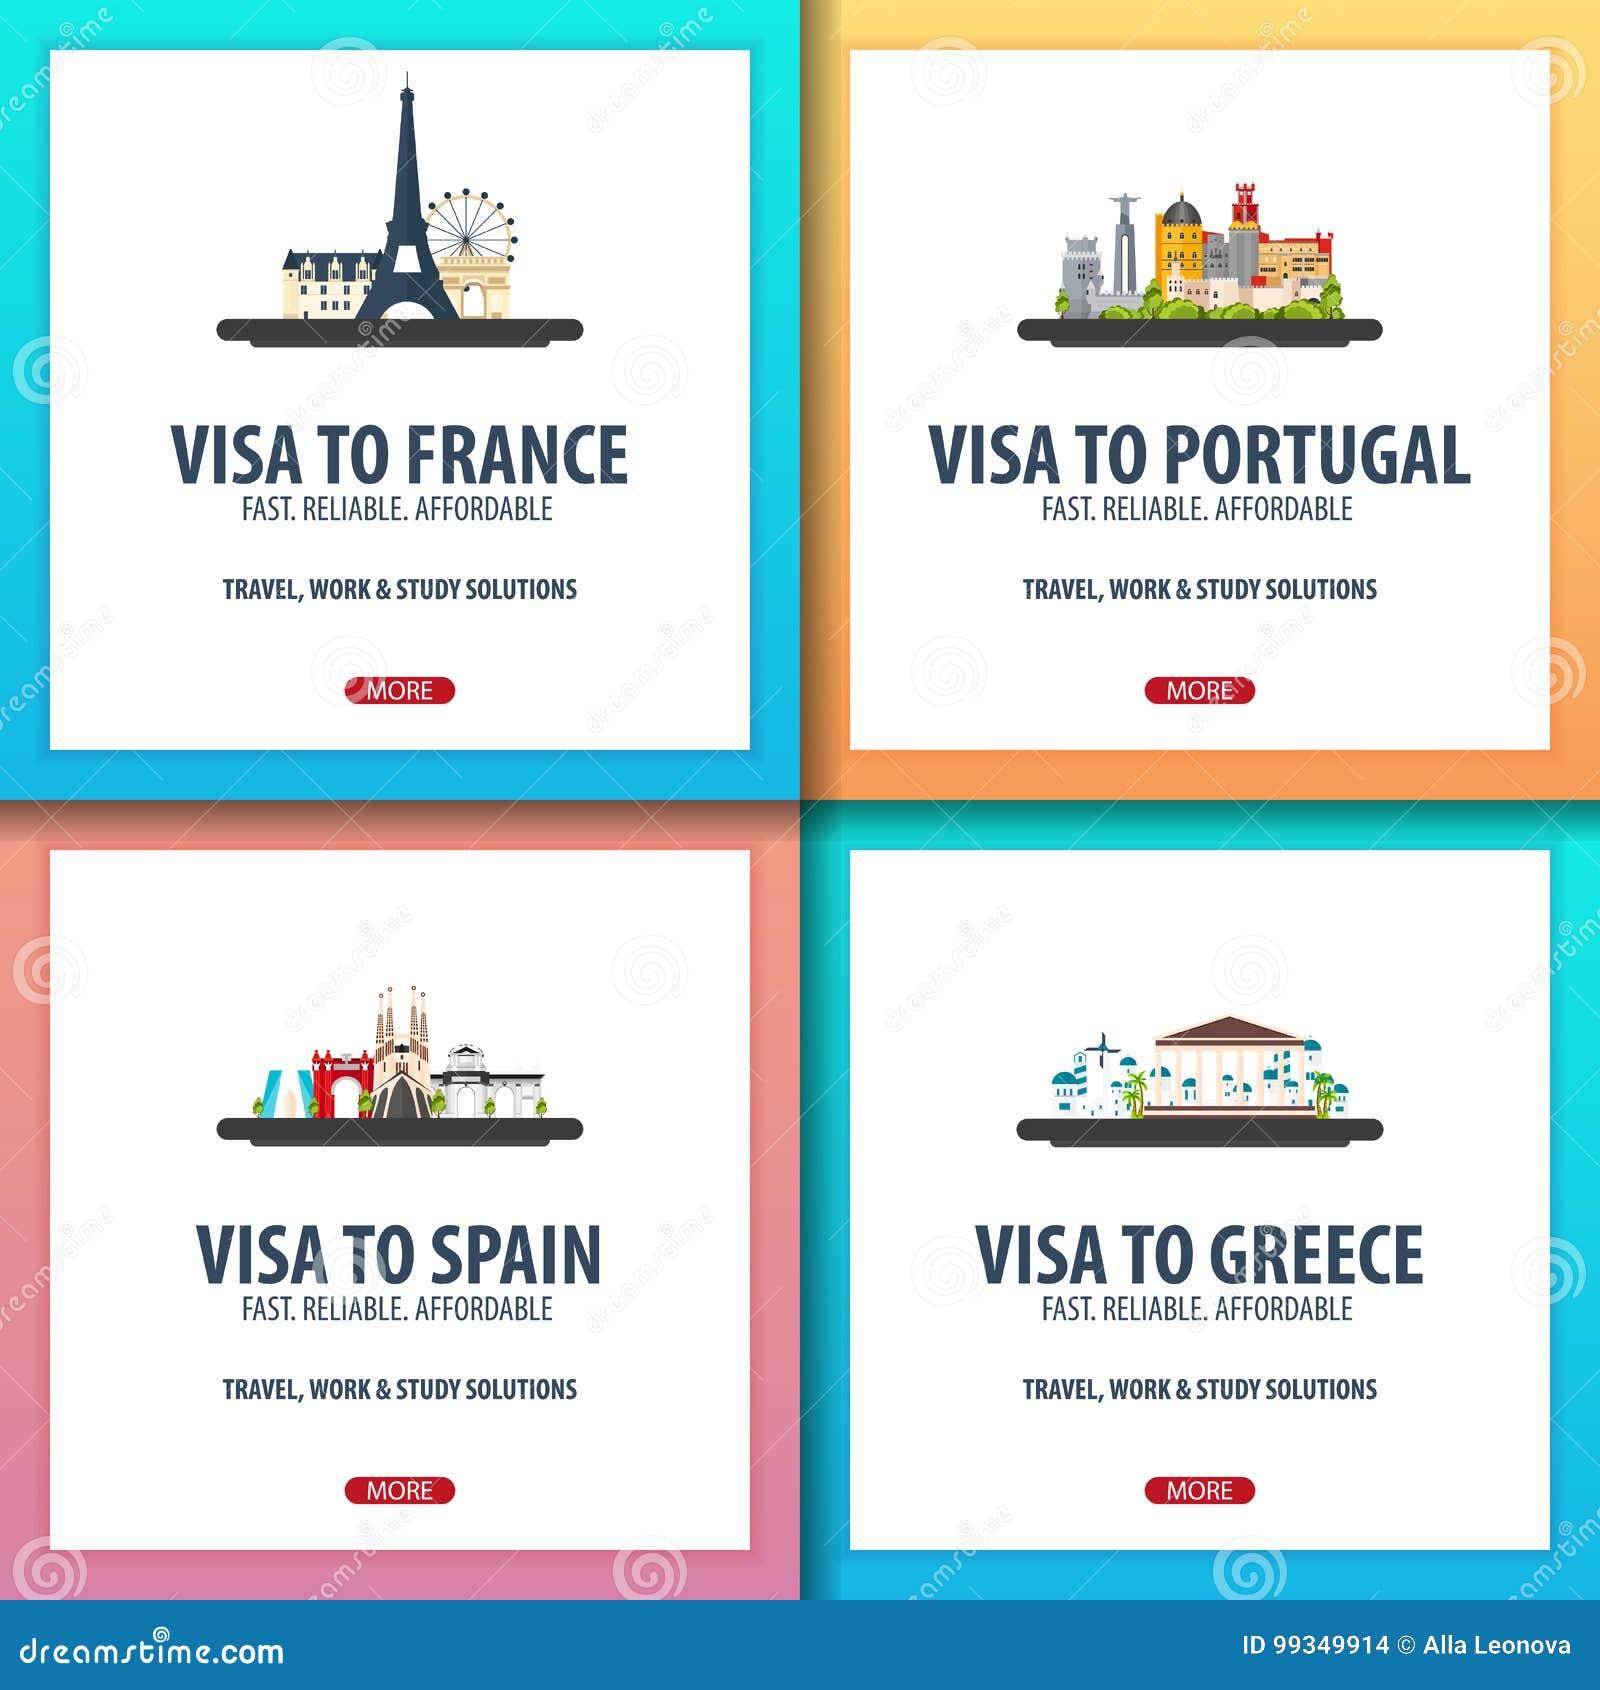 france visa application centre london